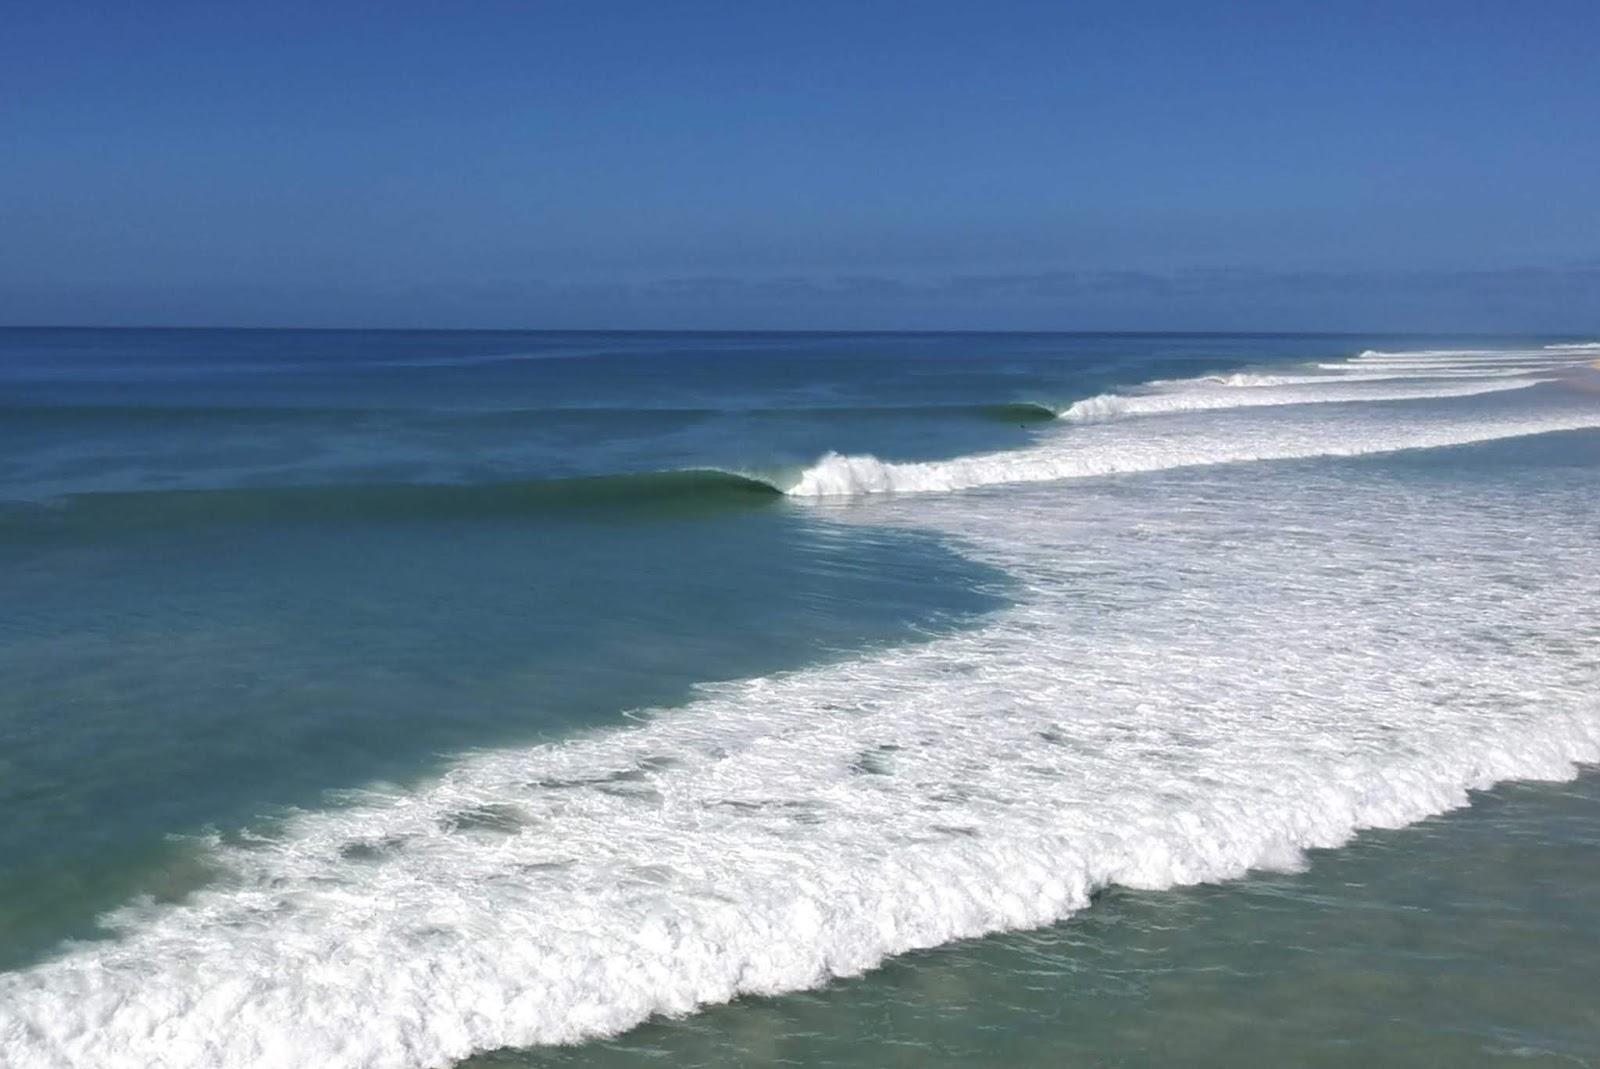 natxo gonzalez surfer 02